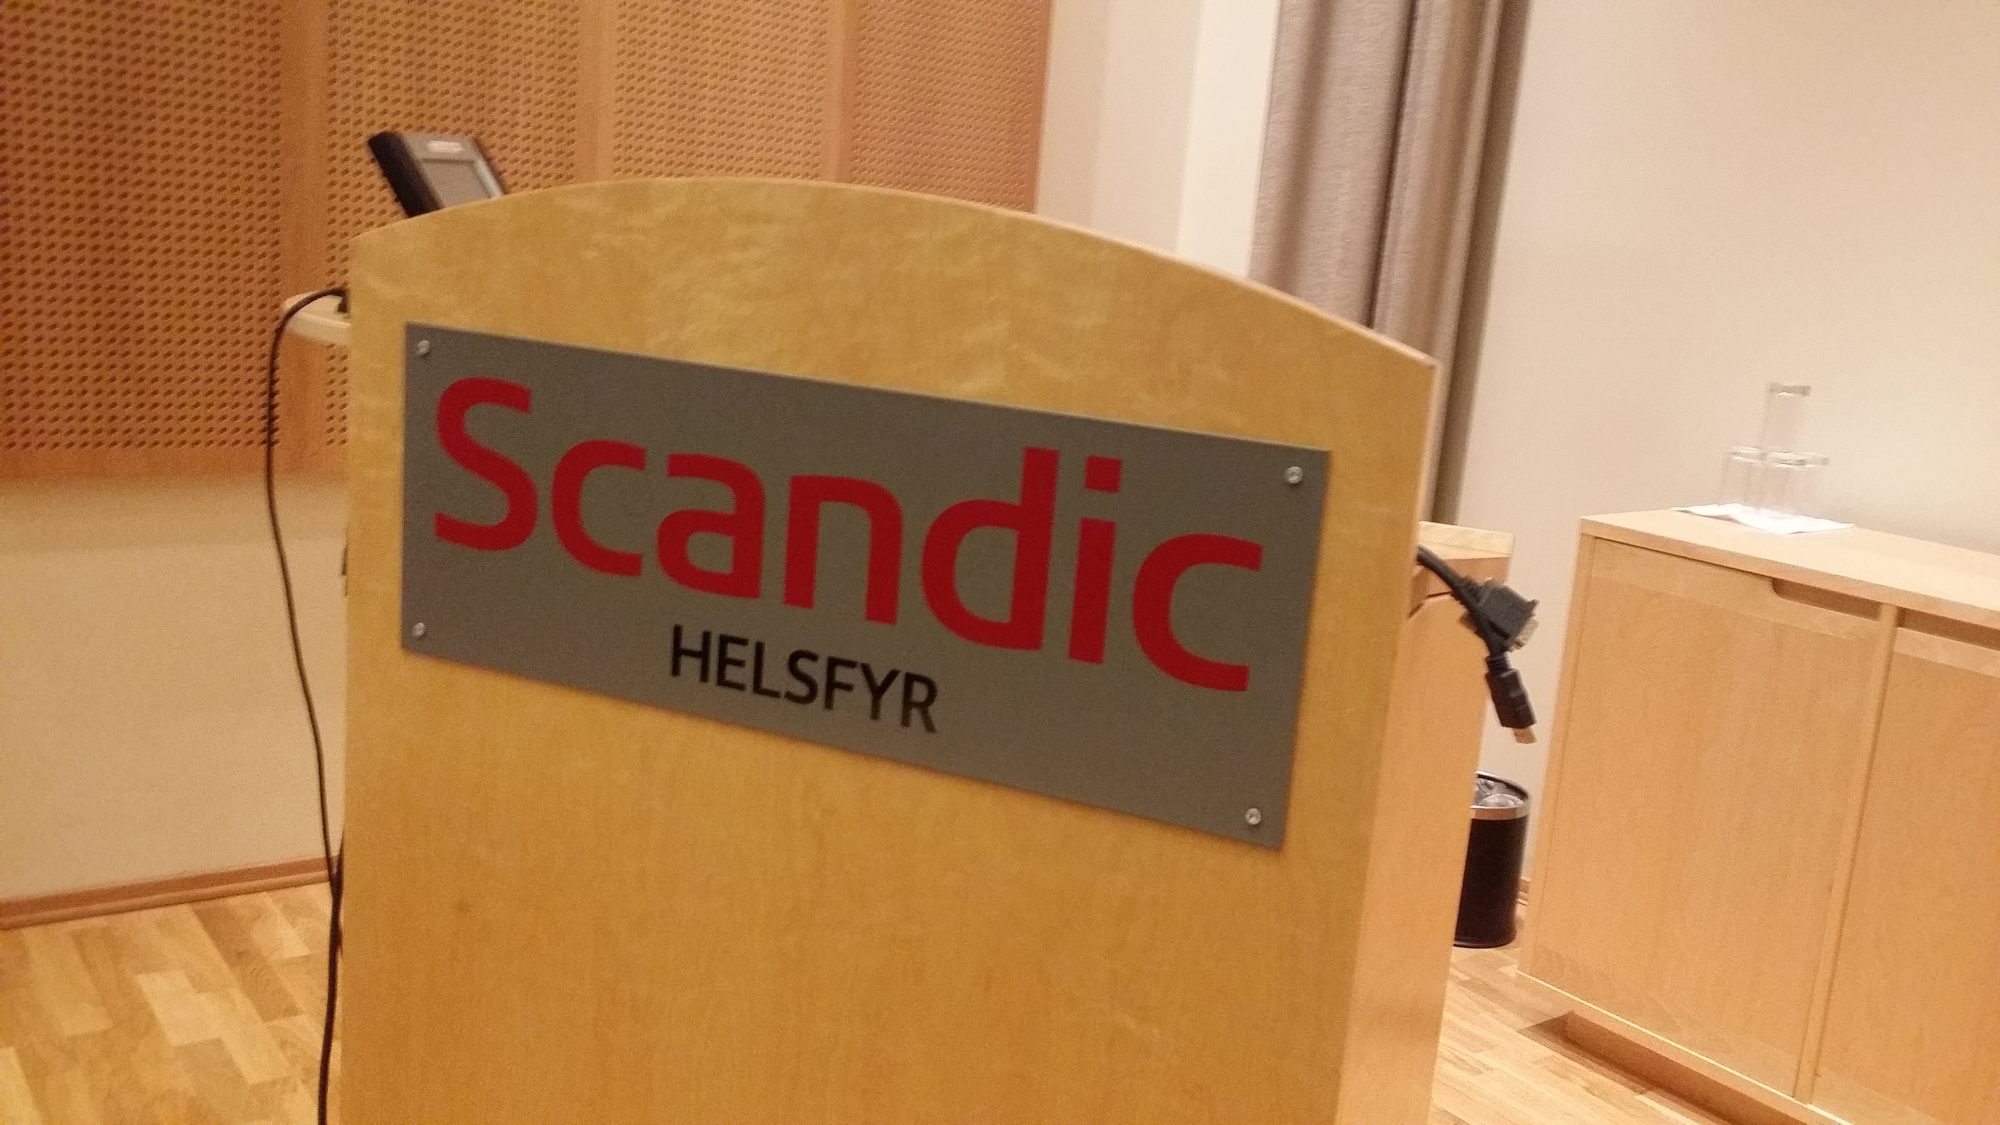 Scandic Helsfyr (7)